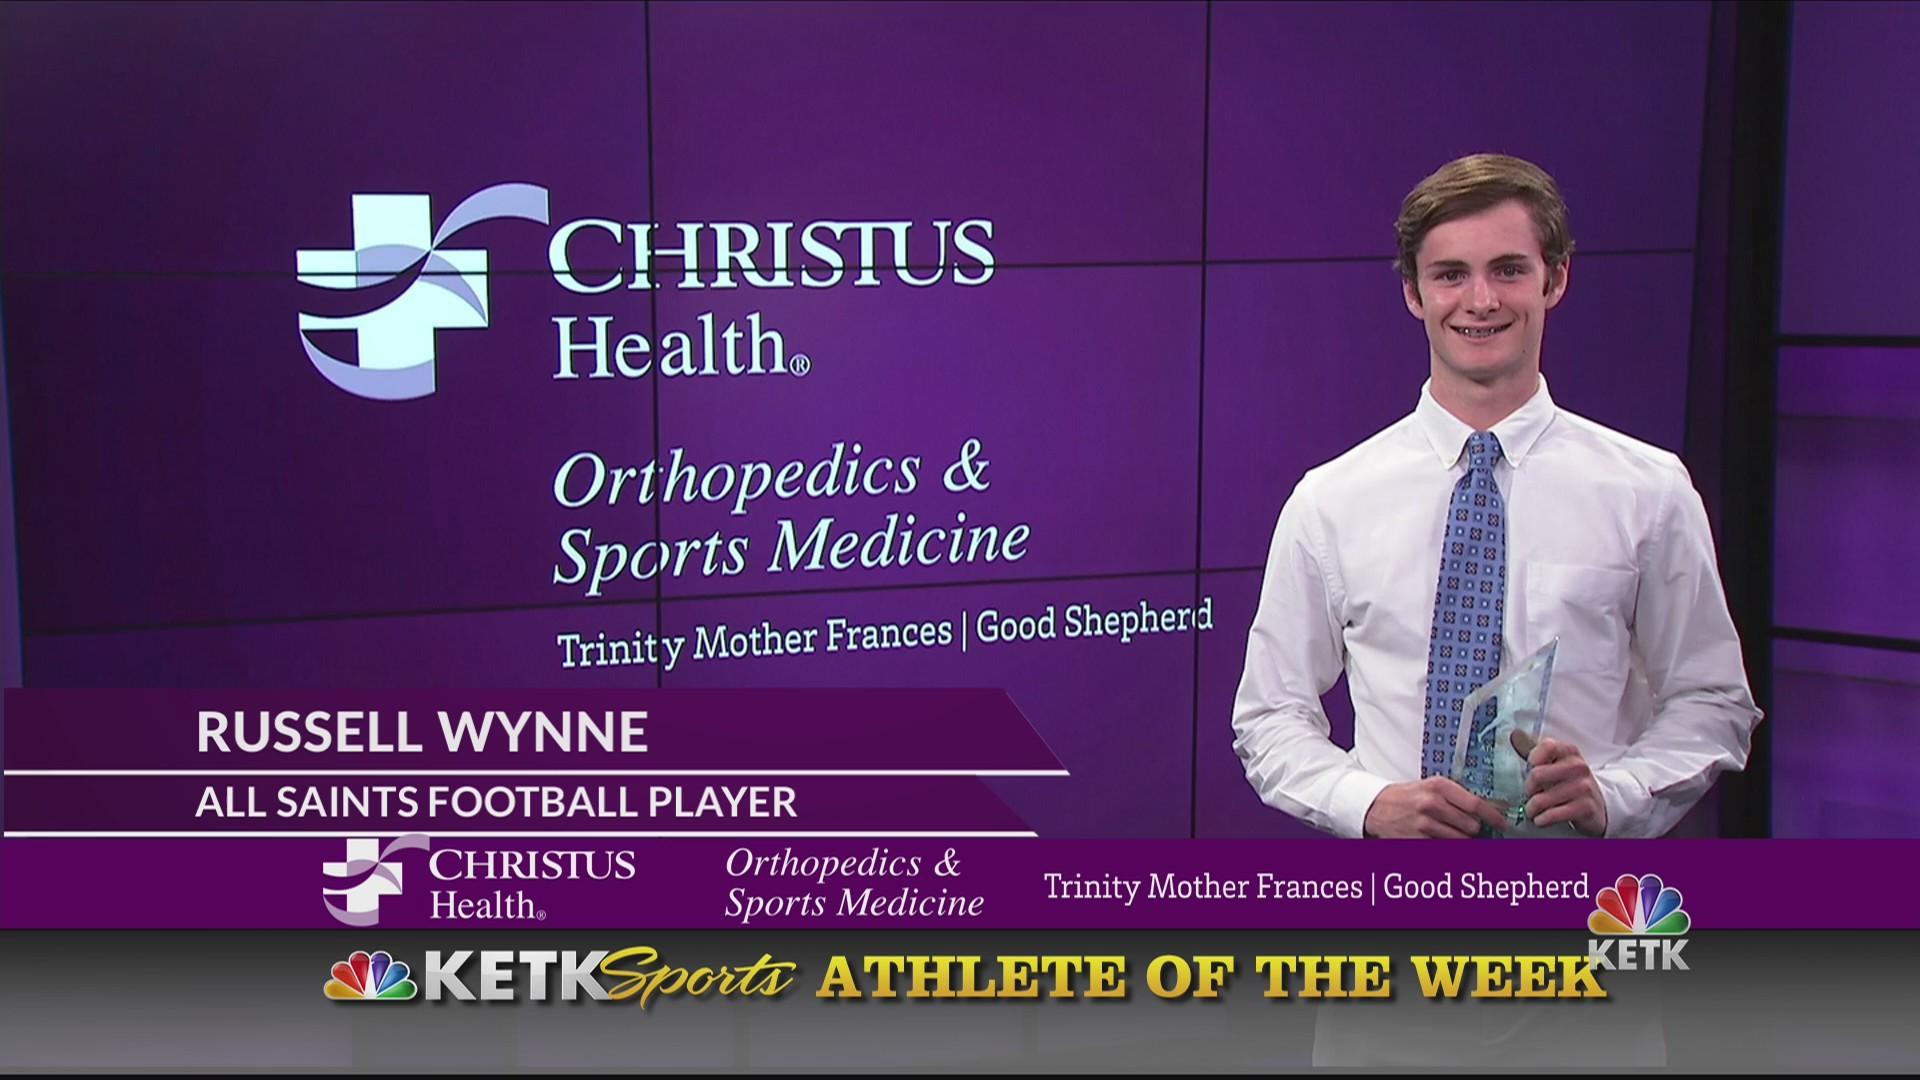 Athlete_of_the_Week__Russell_Wynne_0_20181126053631